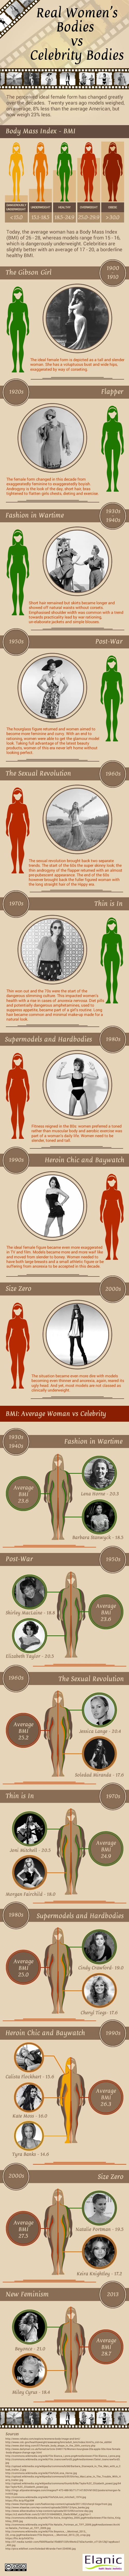 The BMI of Real Women vs Celebrities